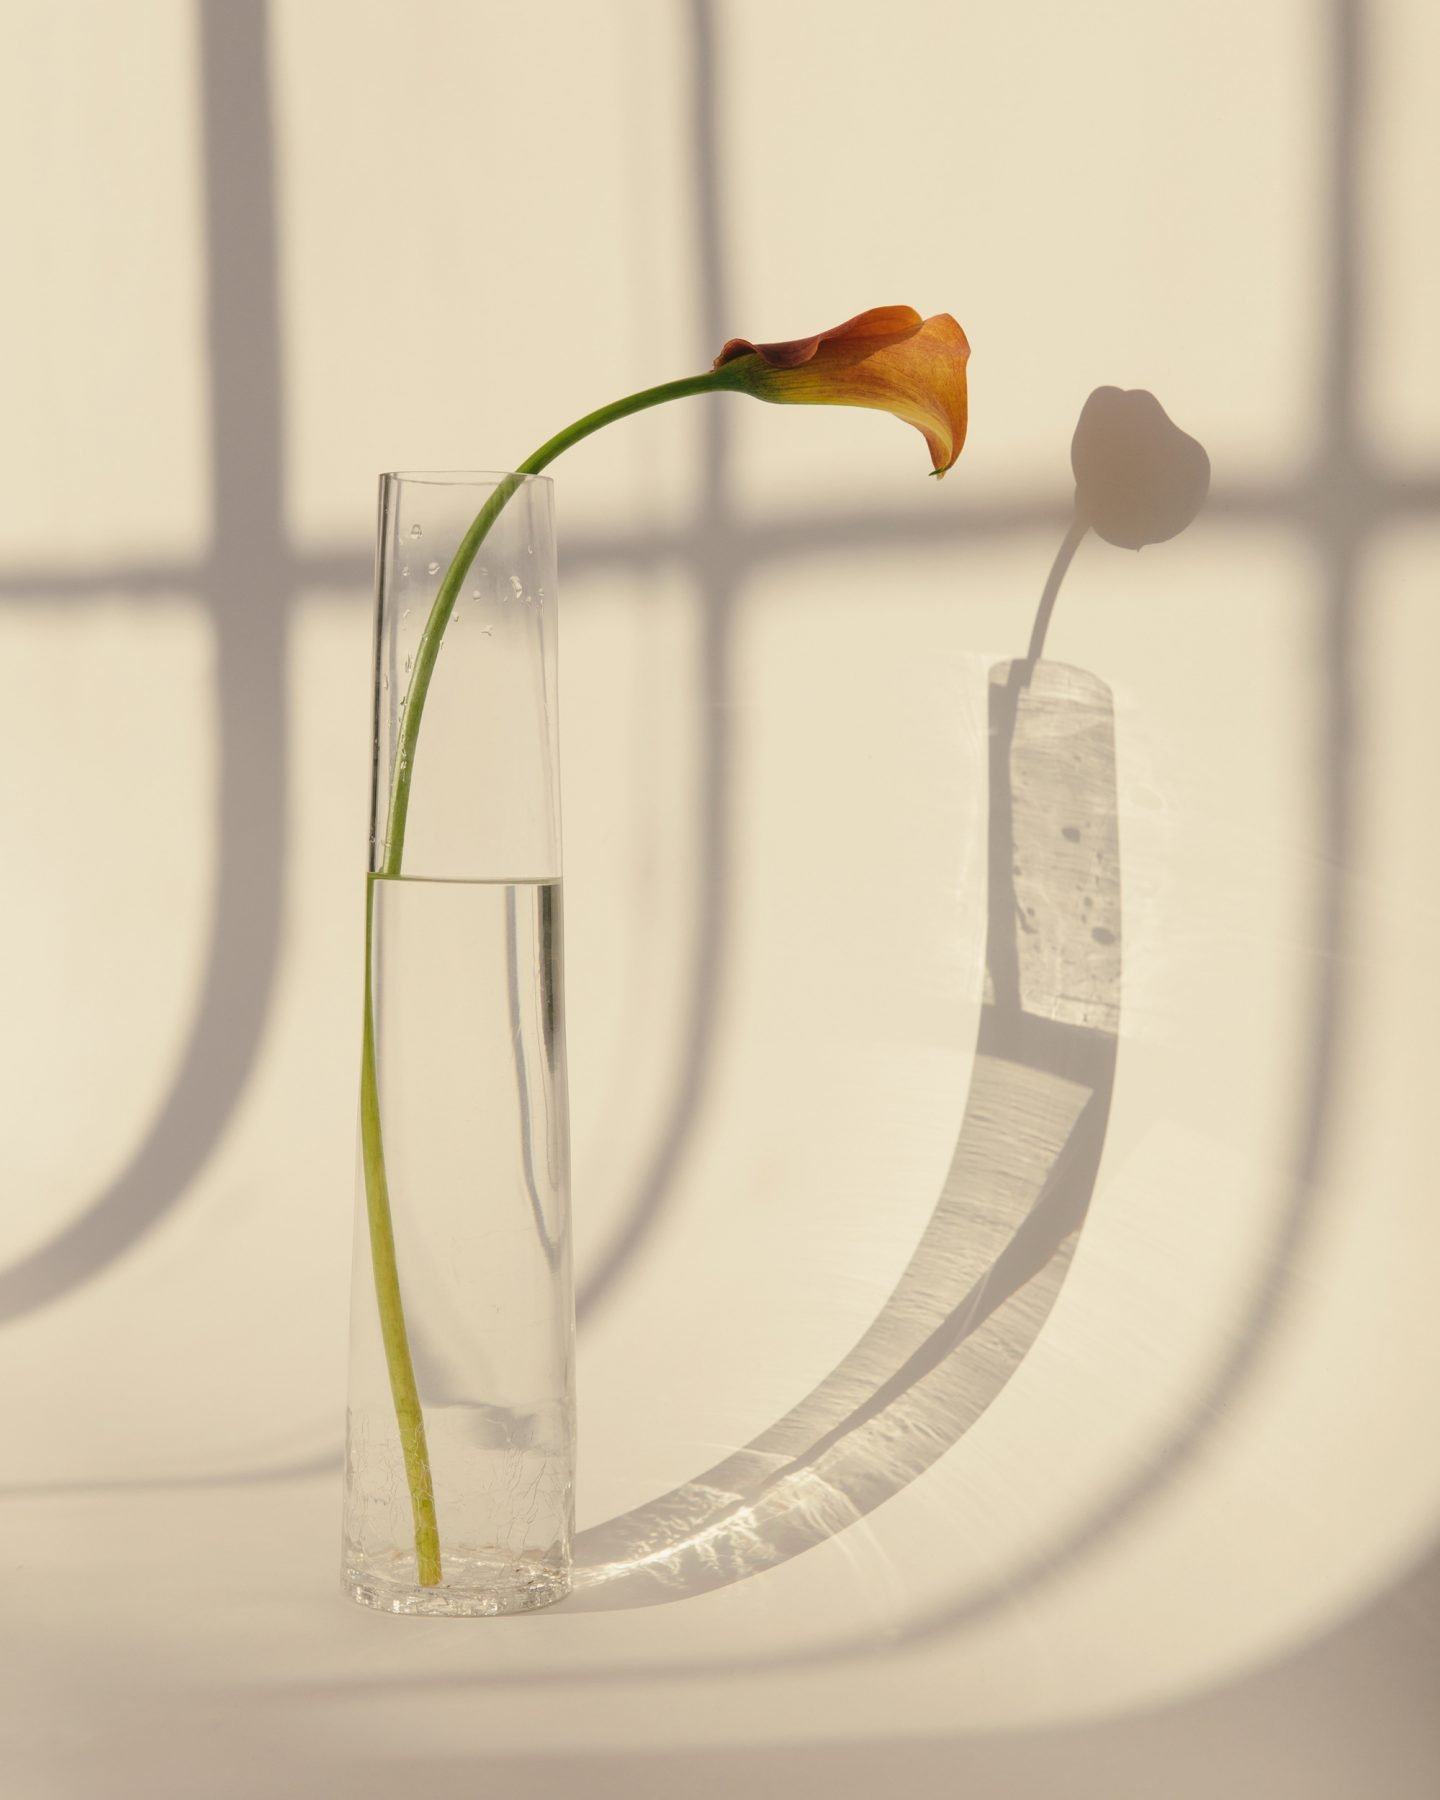 IGNANT-Photography-DavidUrbanke-12